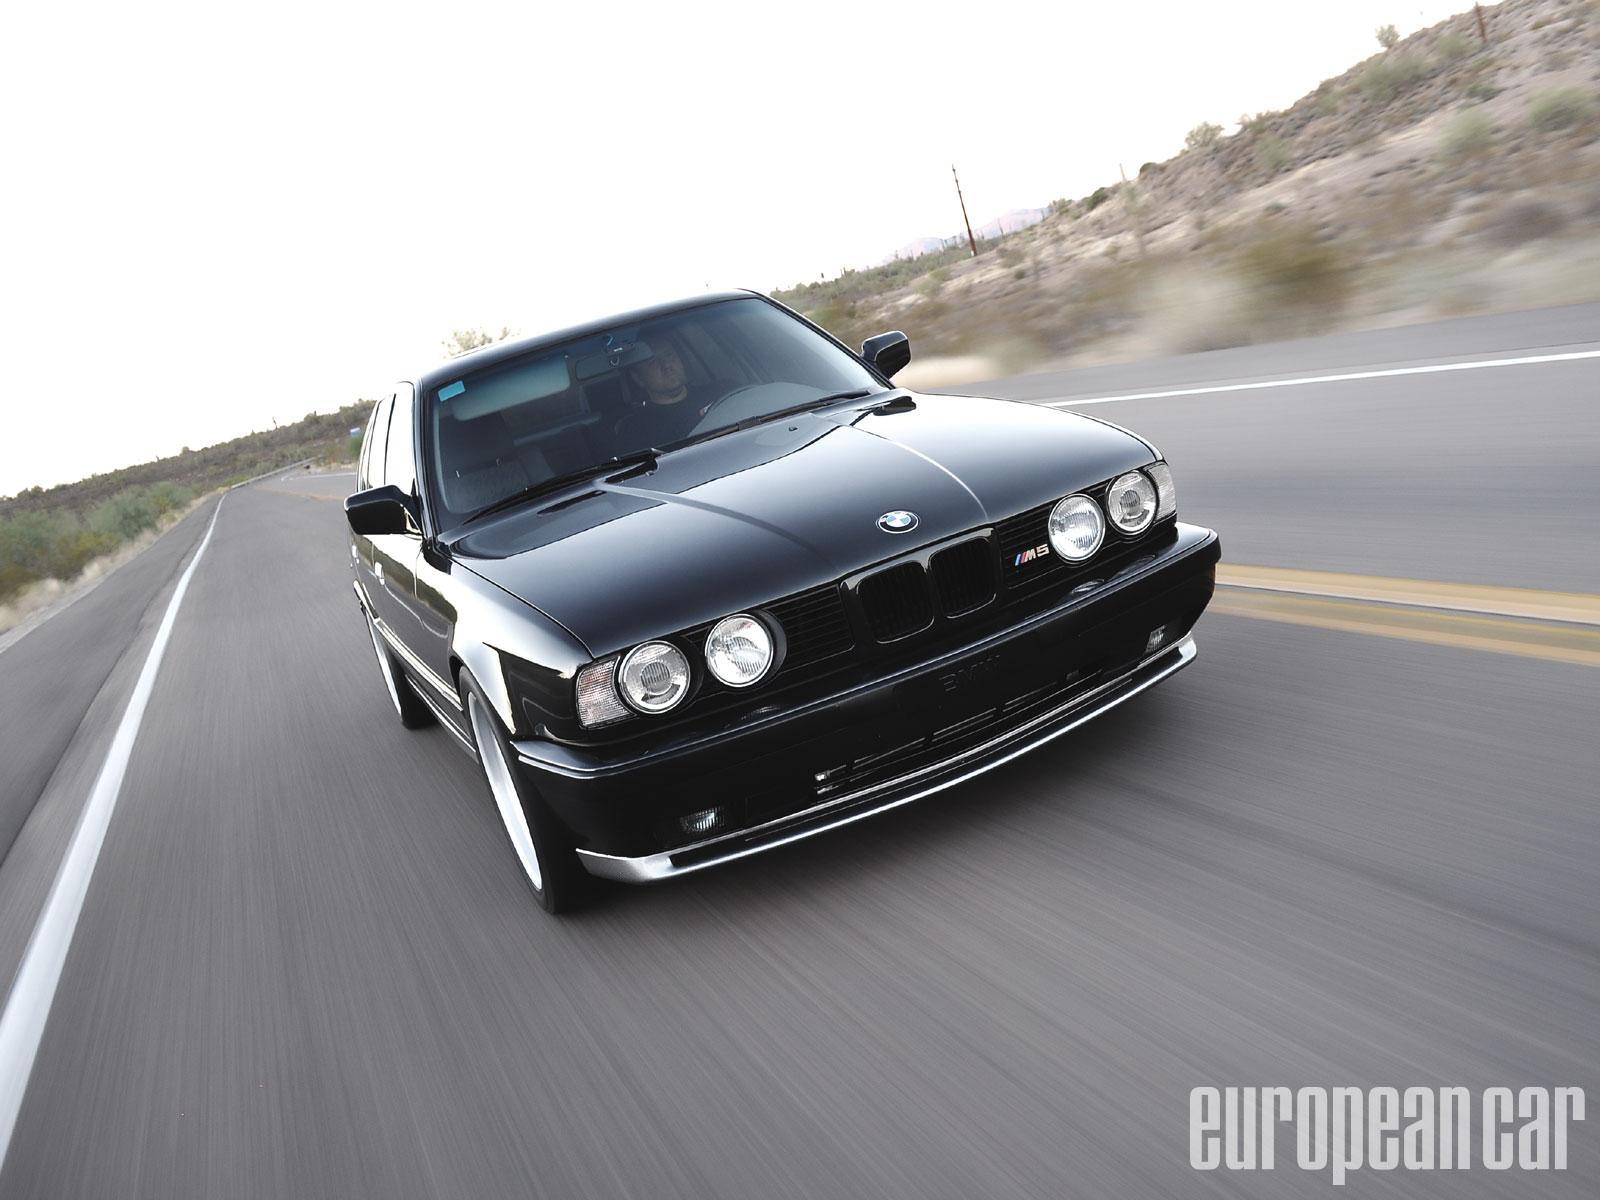 1991 BMW M5 - European Car Magazine